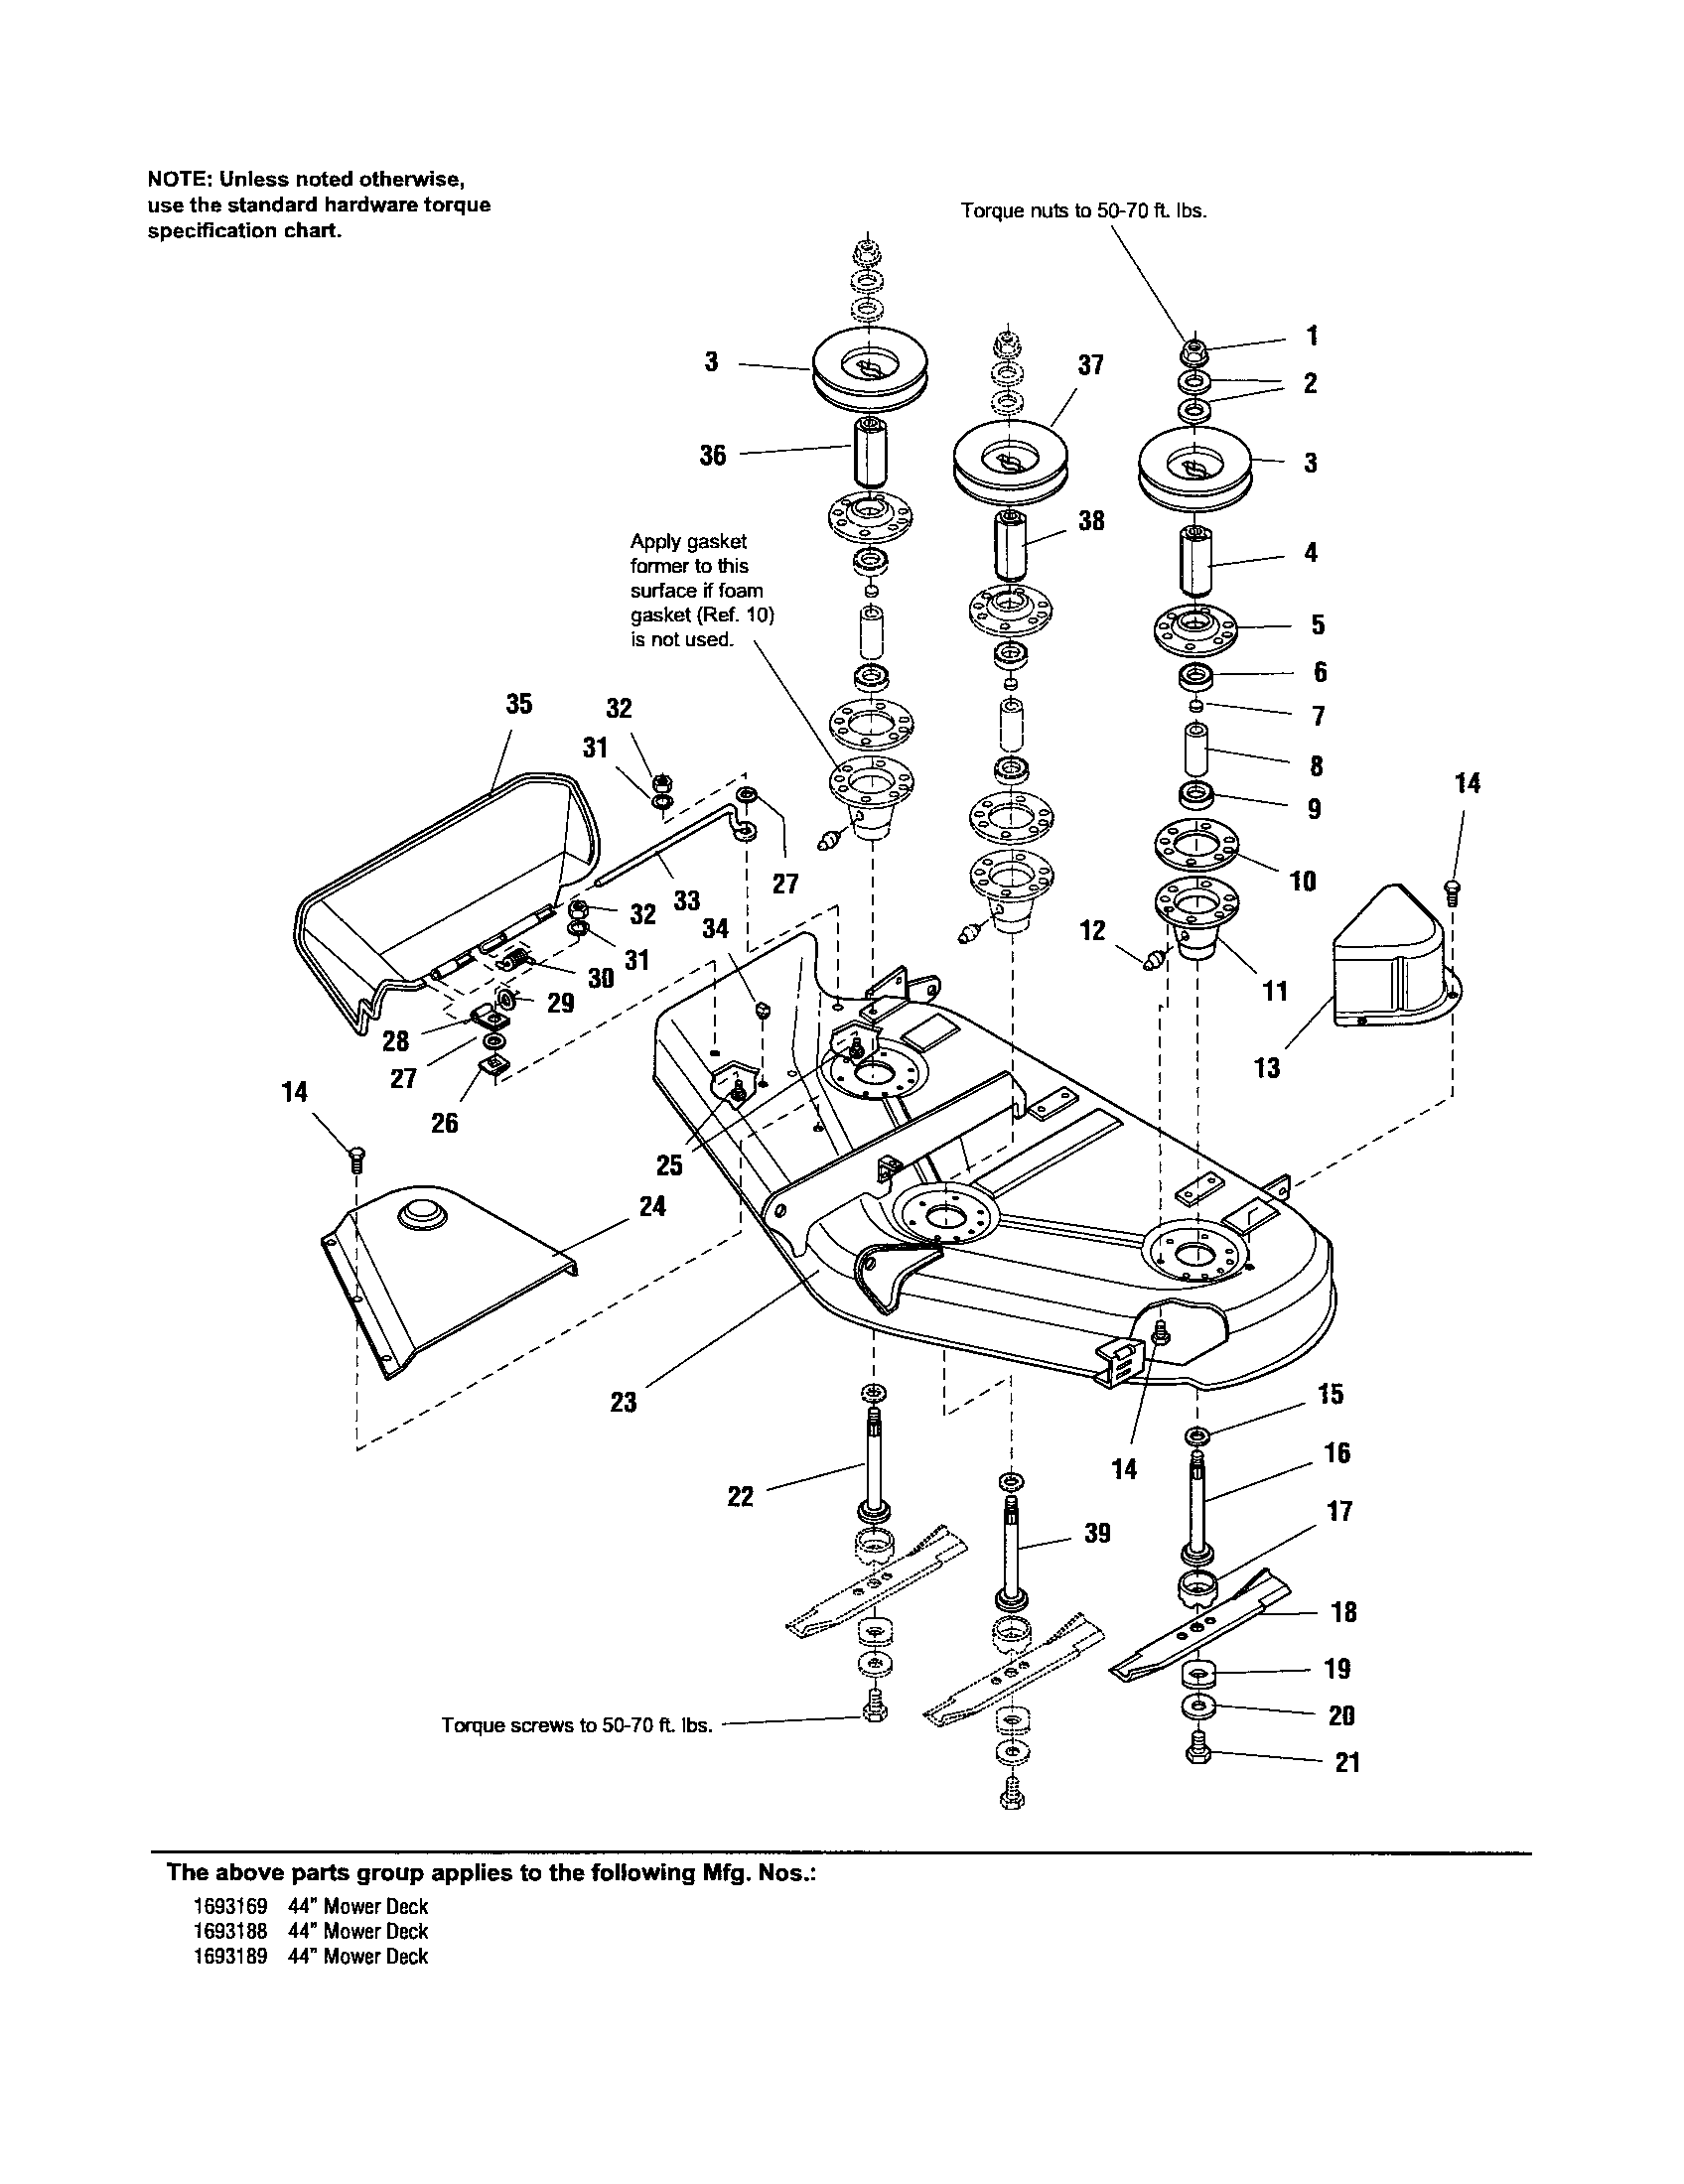 HOUSING/ARBORS/BLADES Diagram & Parts List for Model